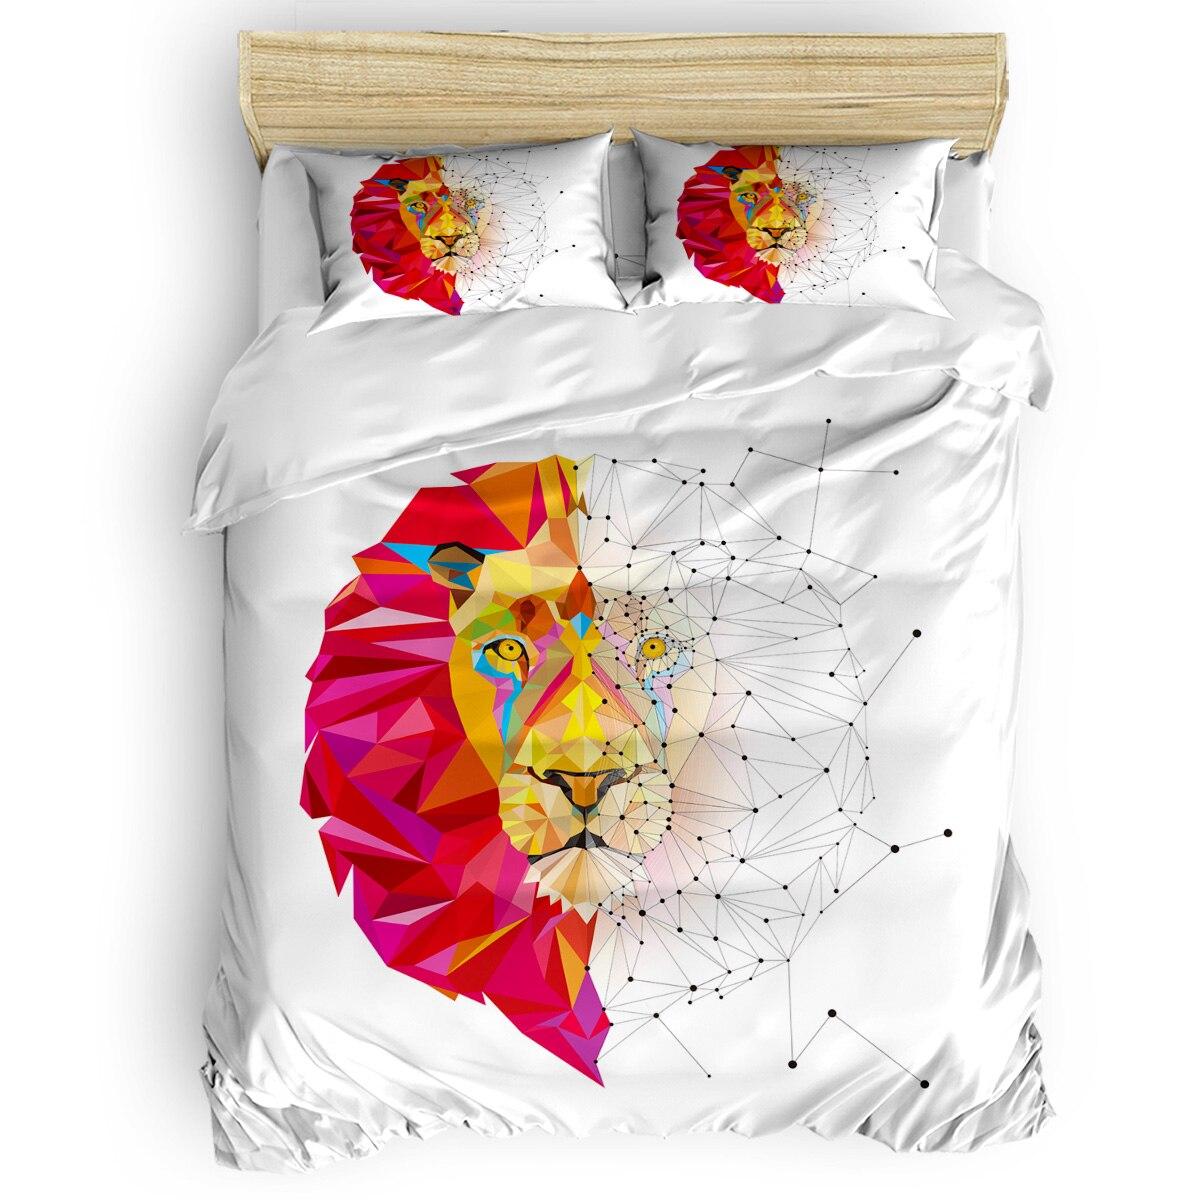 Geometric Block Lion National Flag Day Duvet Cover Sets California King Comforter Sets Mother S Day Living Room April Fools Bedding Sets Aliexpress